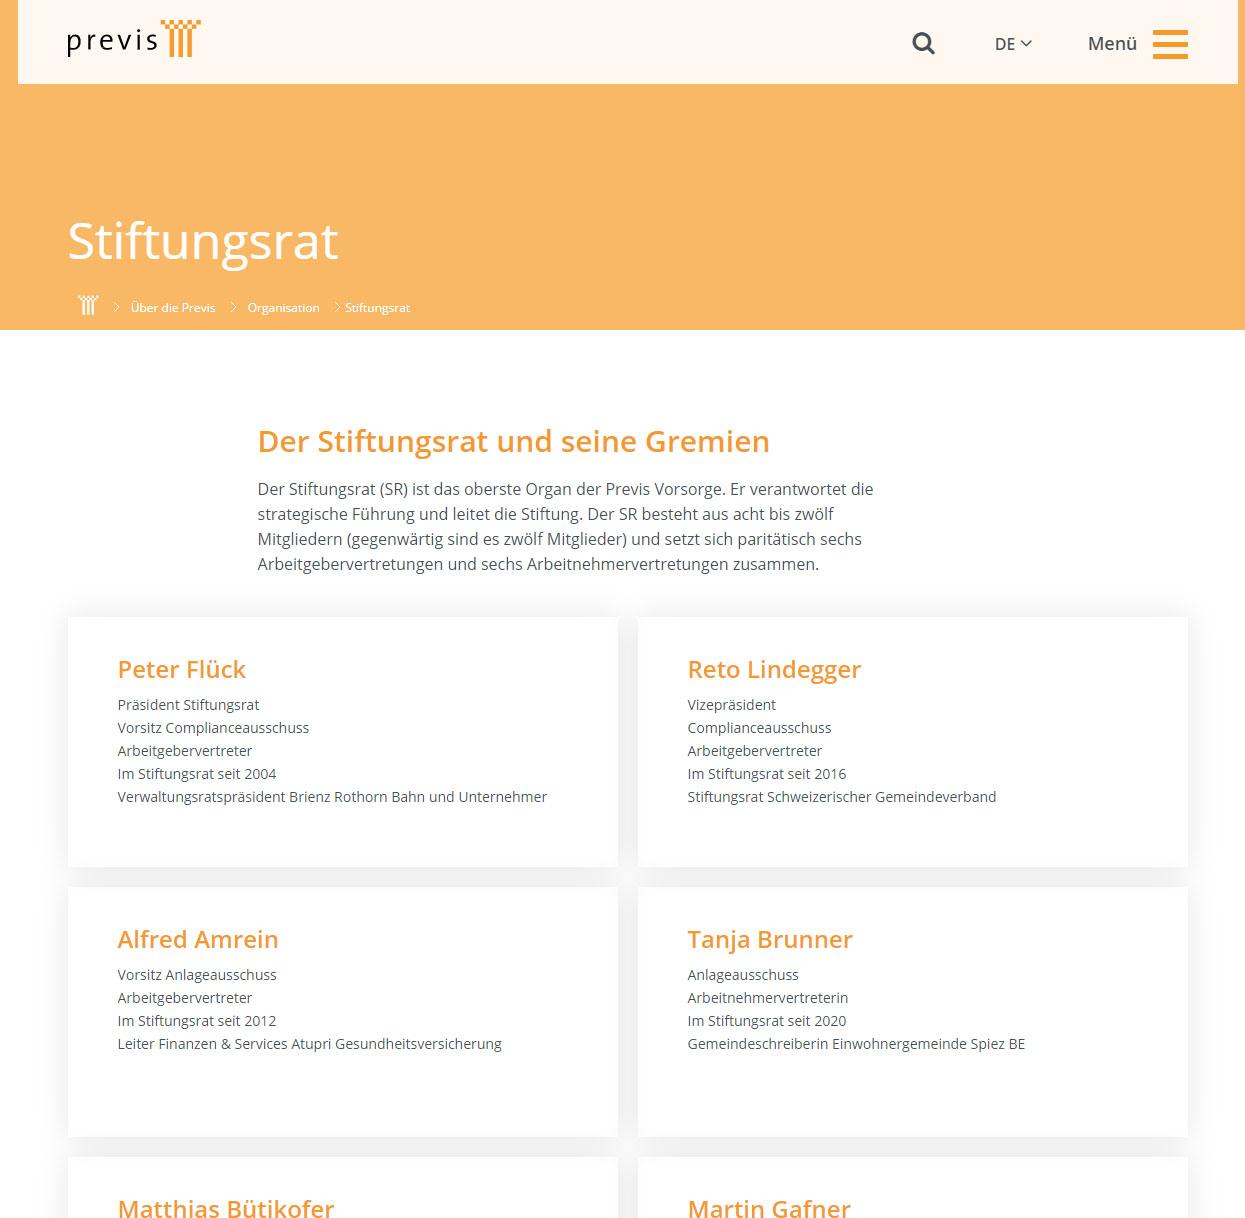 Screenshot Previs Pensionskasse Stiftungsrat Peter Flück Reto Lindegger